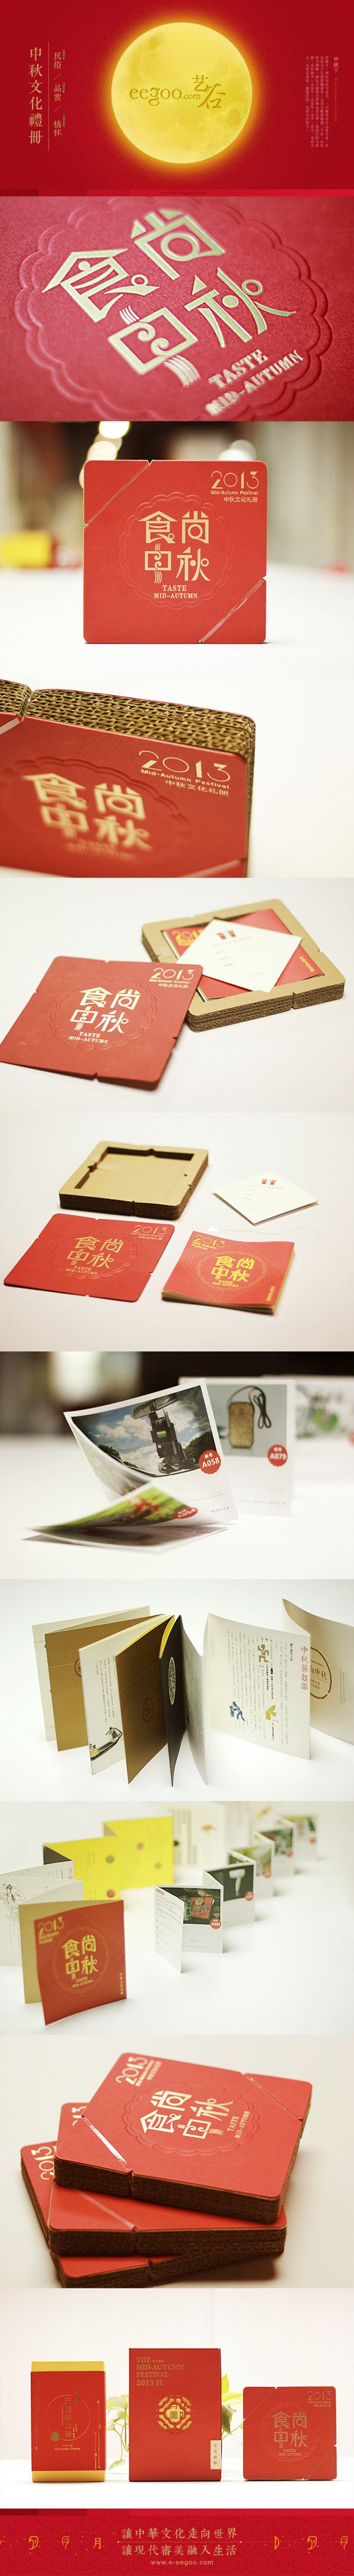 The Mid-Autumn Festival gift book by even liu, via Behance